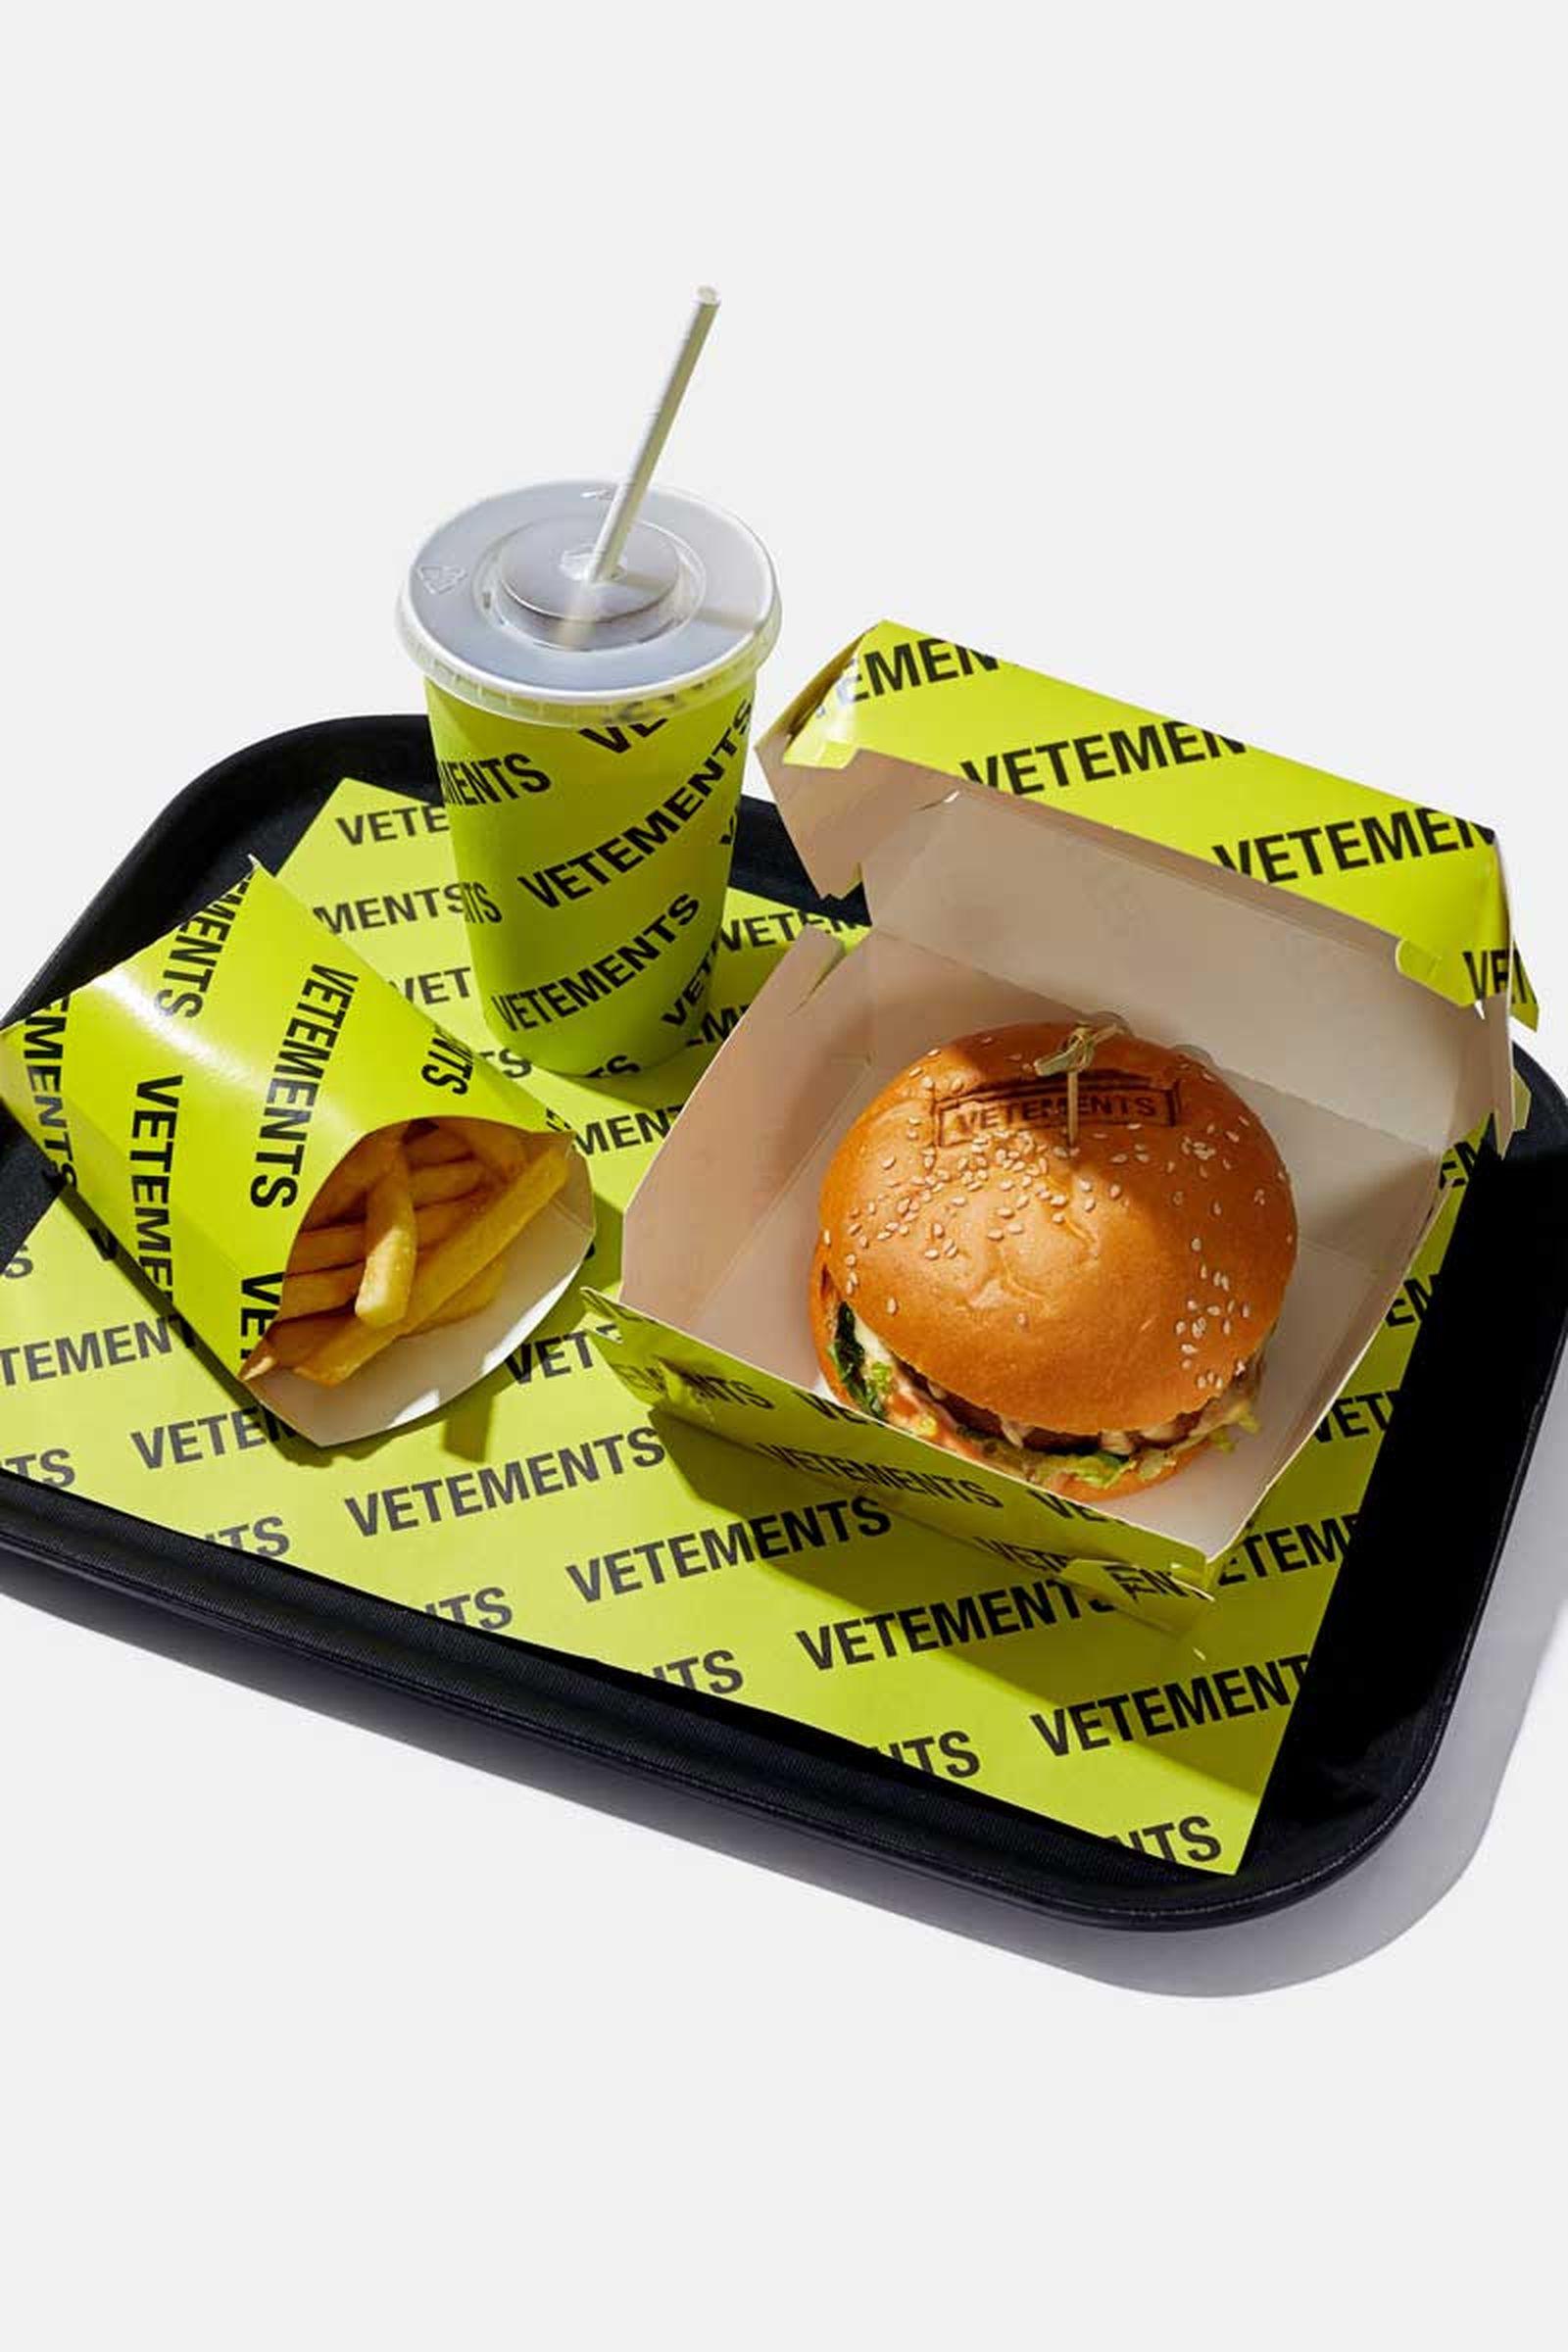 vetements-burger-2-next-level-edition--(5)